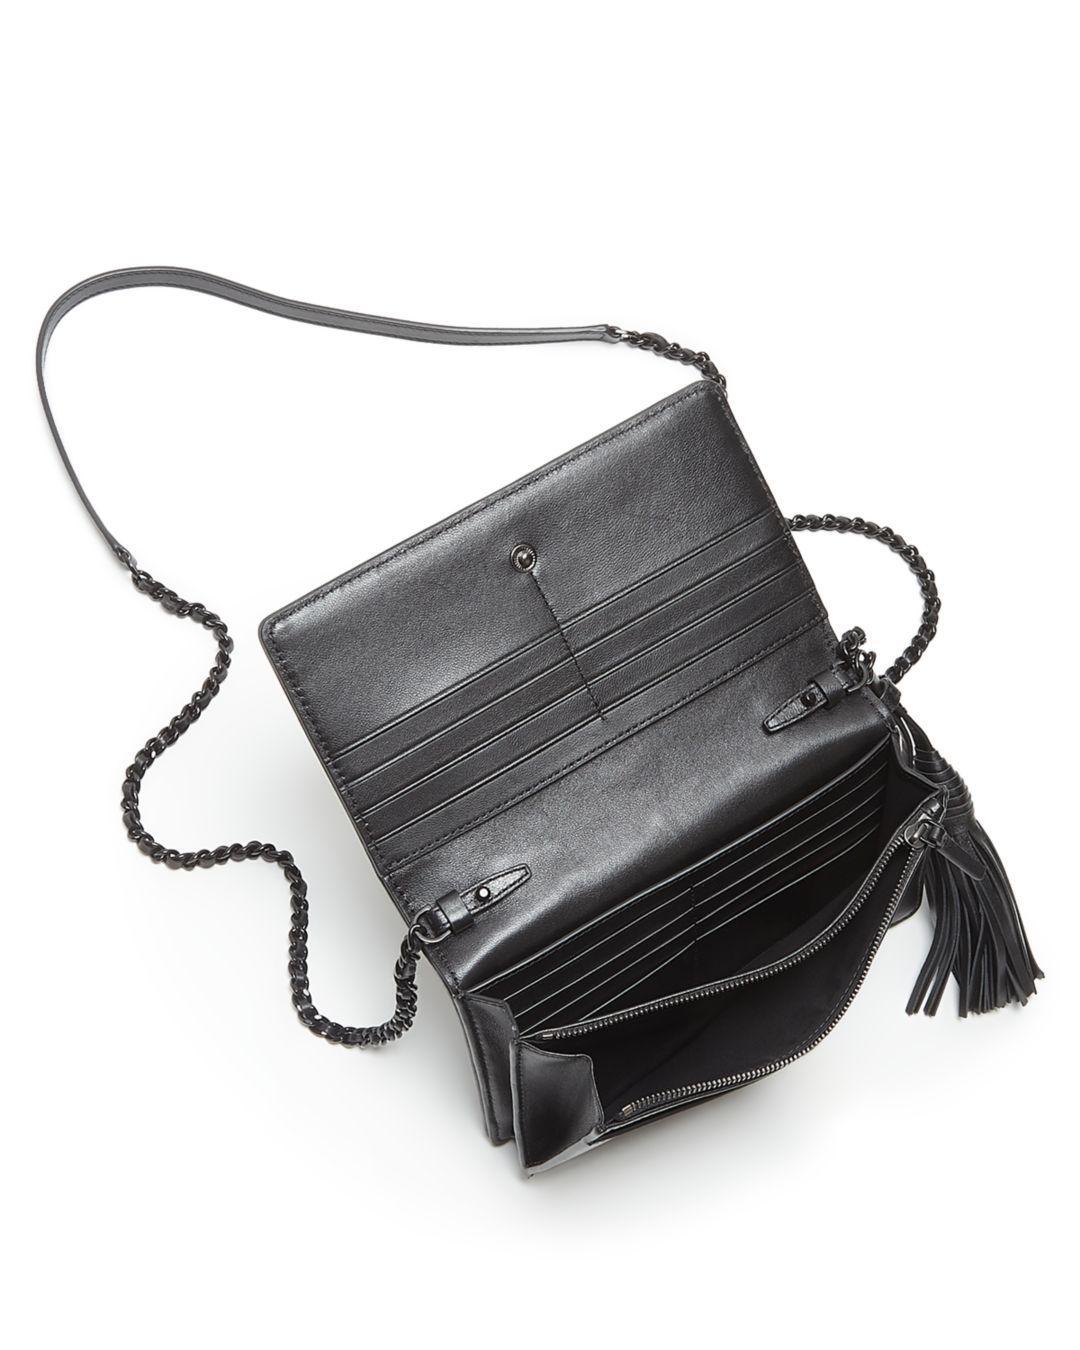 475773b33bb6 Lyst - Tory Burch Fleming Matte Flat Chain Wallet in Black